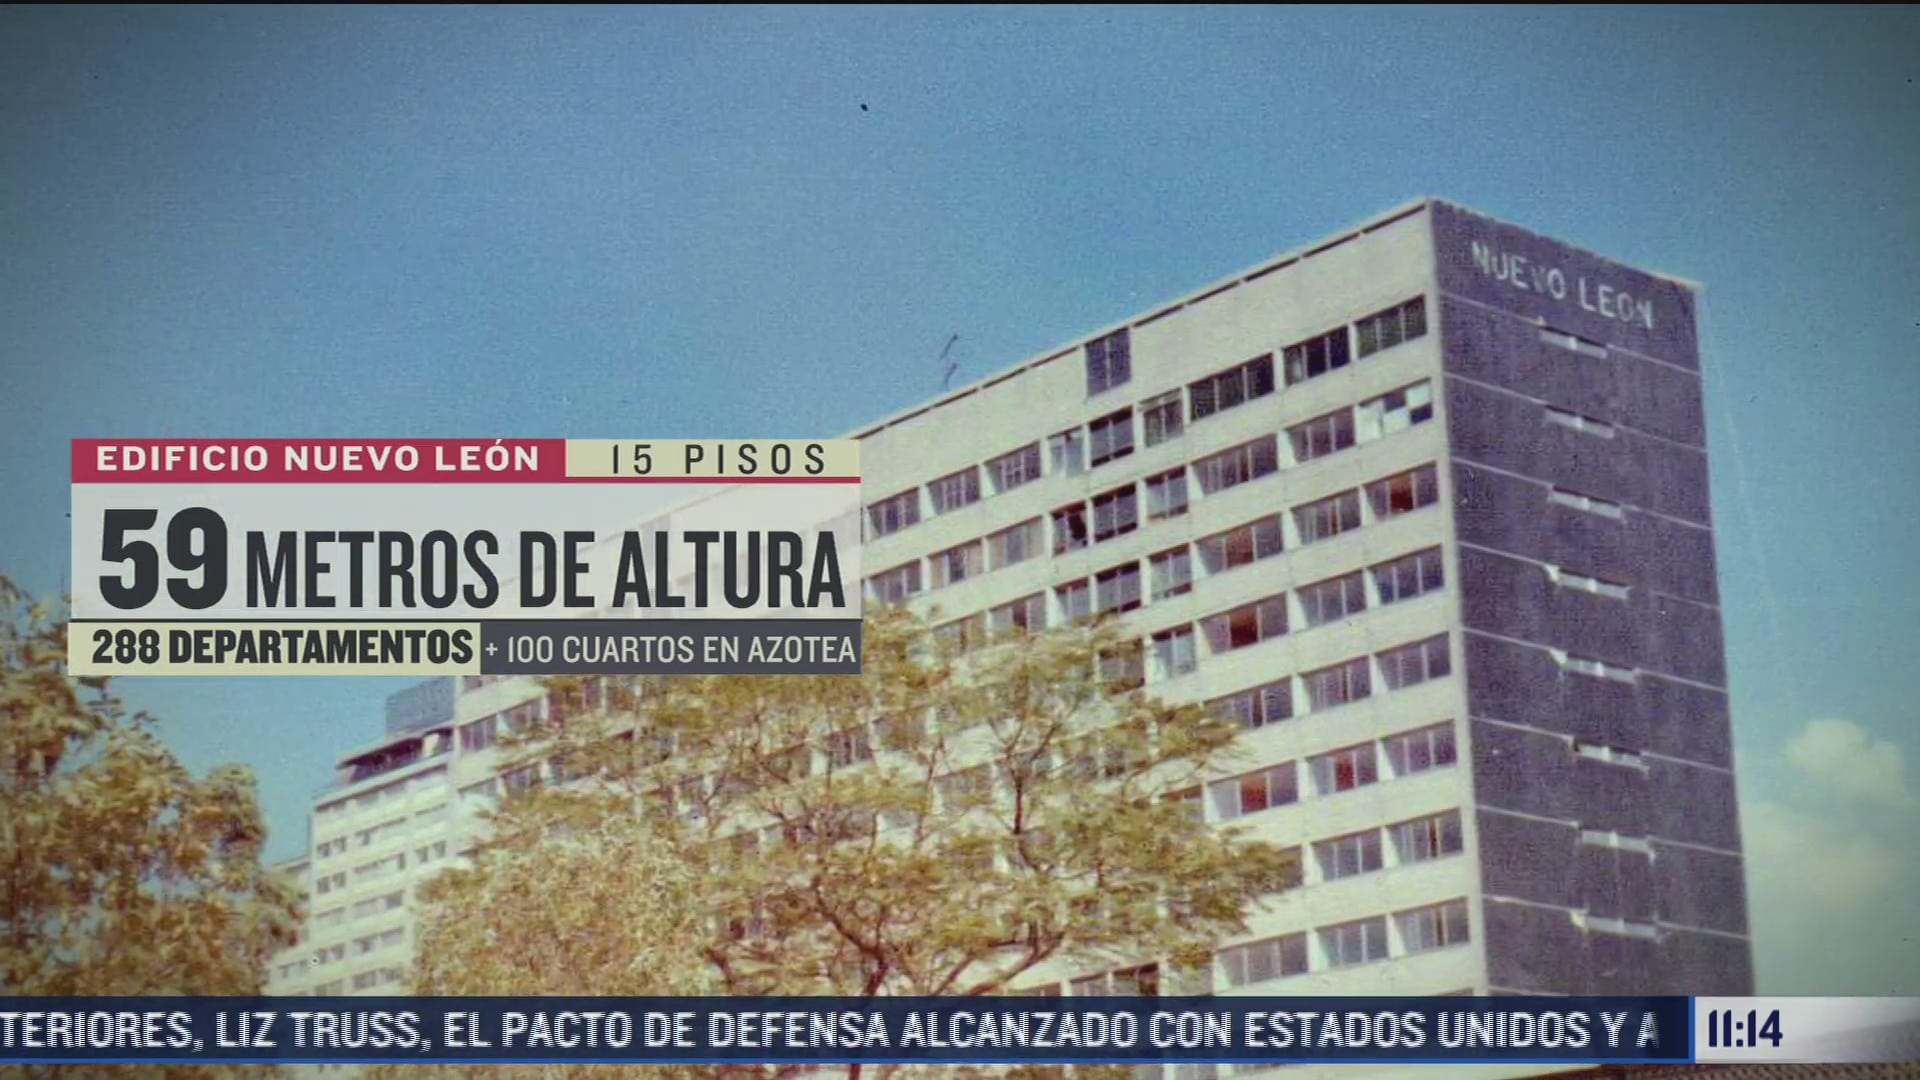 sismo de 1985 derrumbo al edificio nuevo leon en tlatelolco